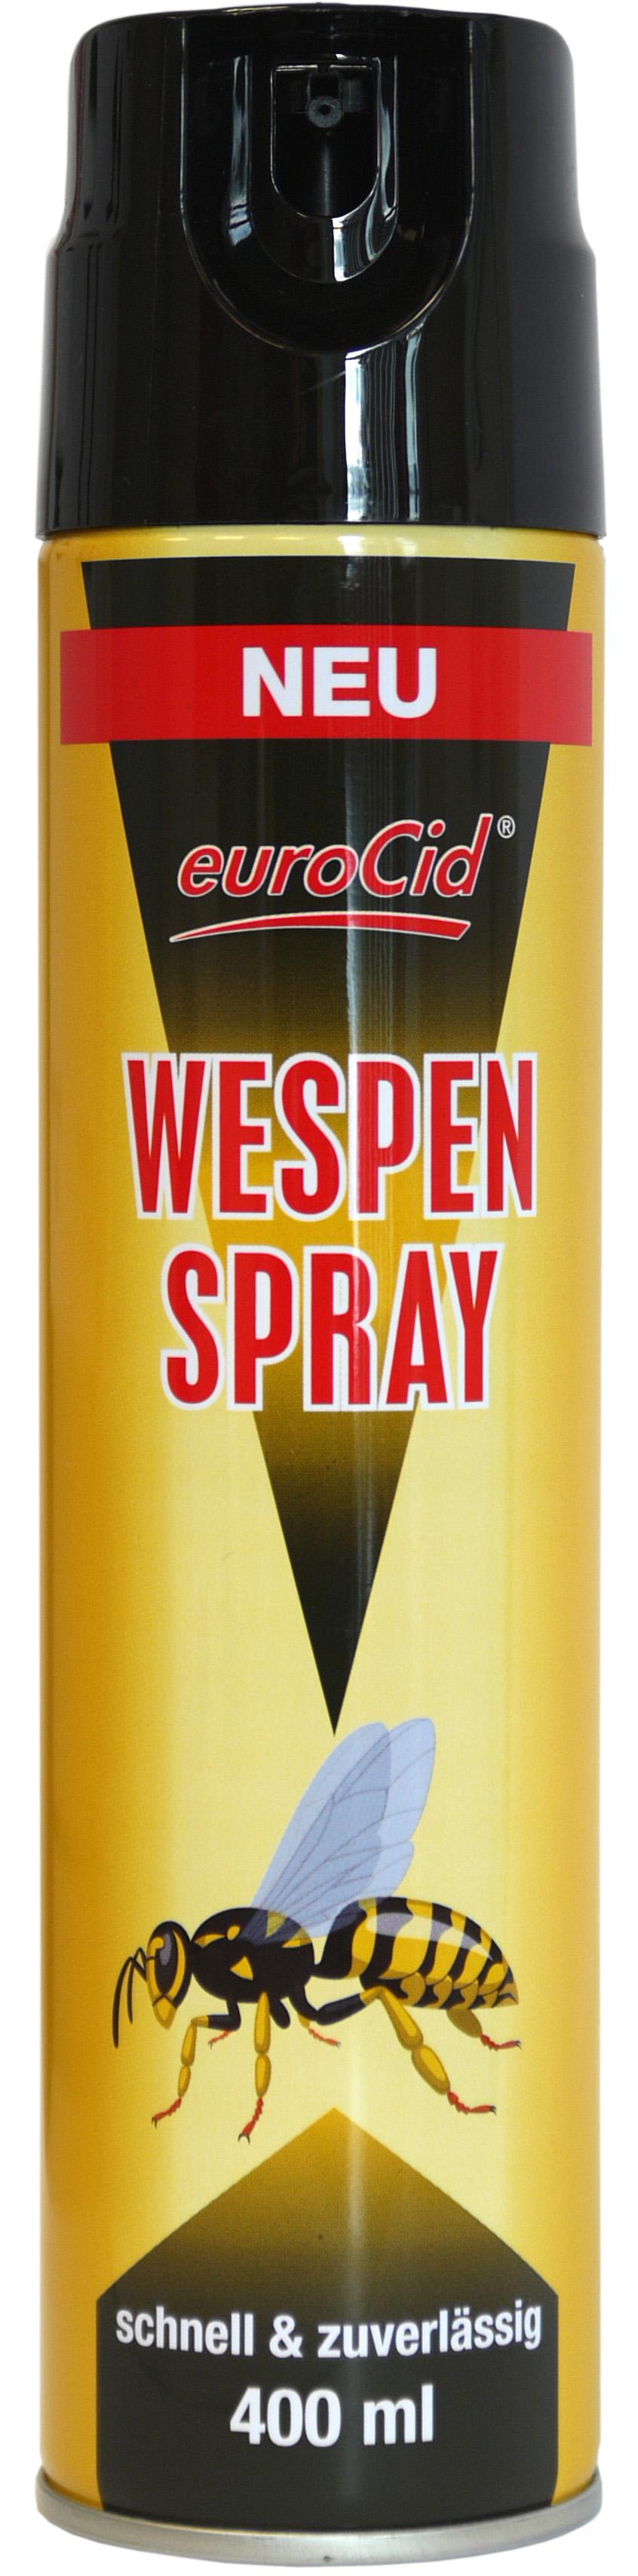 02193 - euroCid Wespenspray 400ml BIOZID